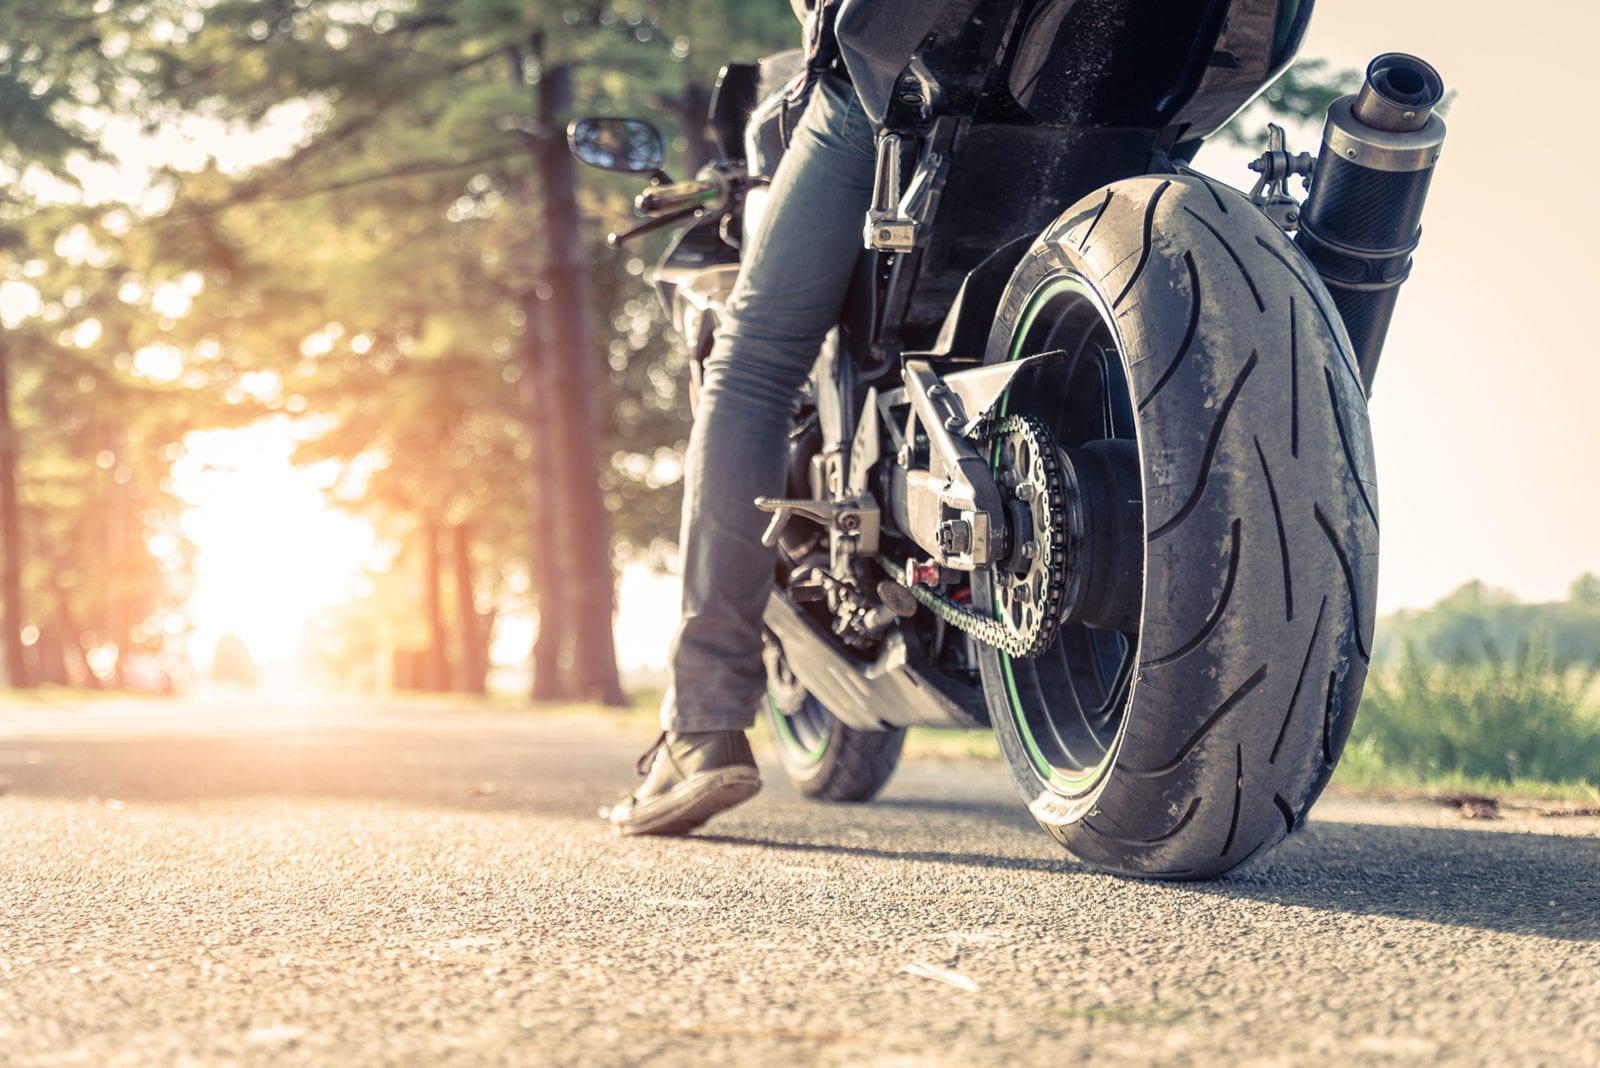 Motorbike Finance Motorcycle Financing Refused Car Finance